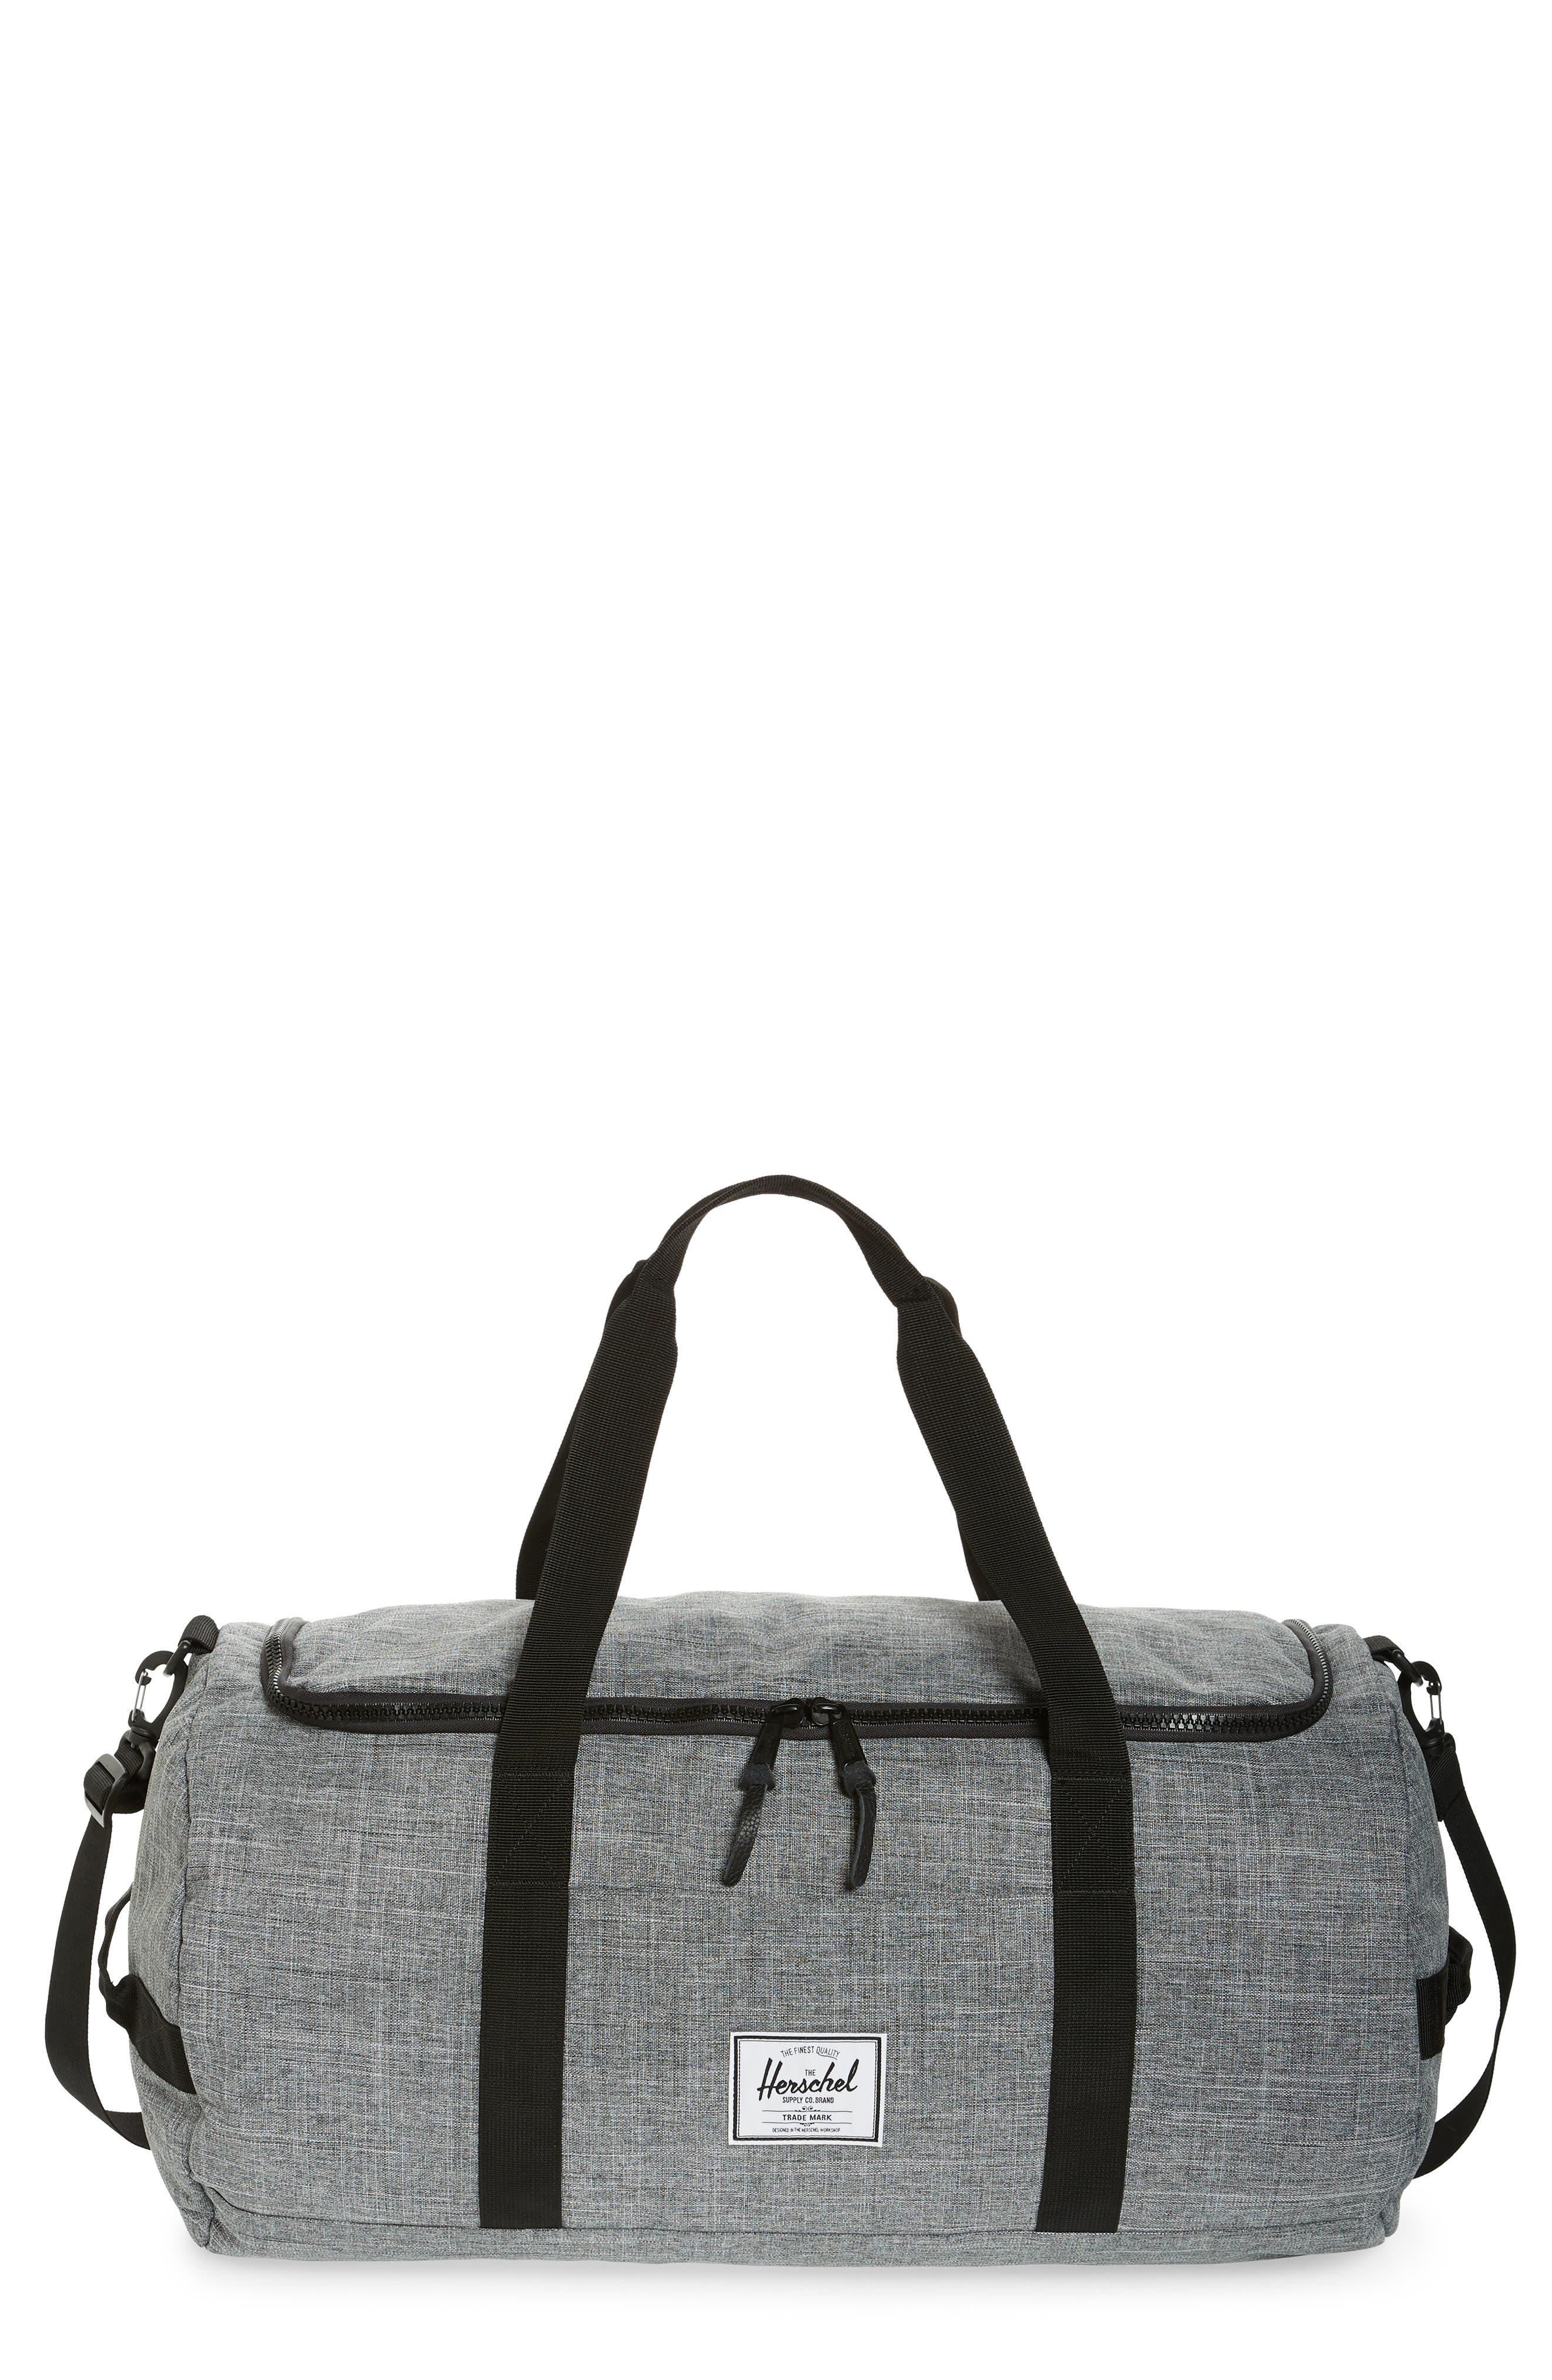 HERSCHEL SUPPLY CO. Sutton Duffel Bag, Main, color, RAVEN CROSSHATCH